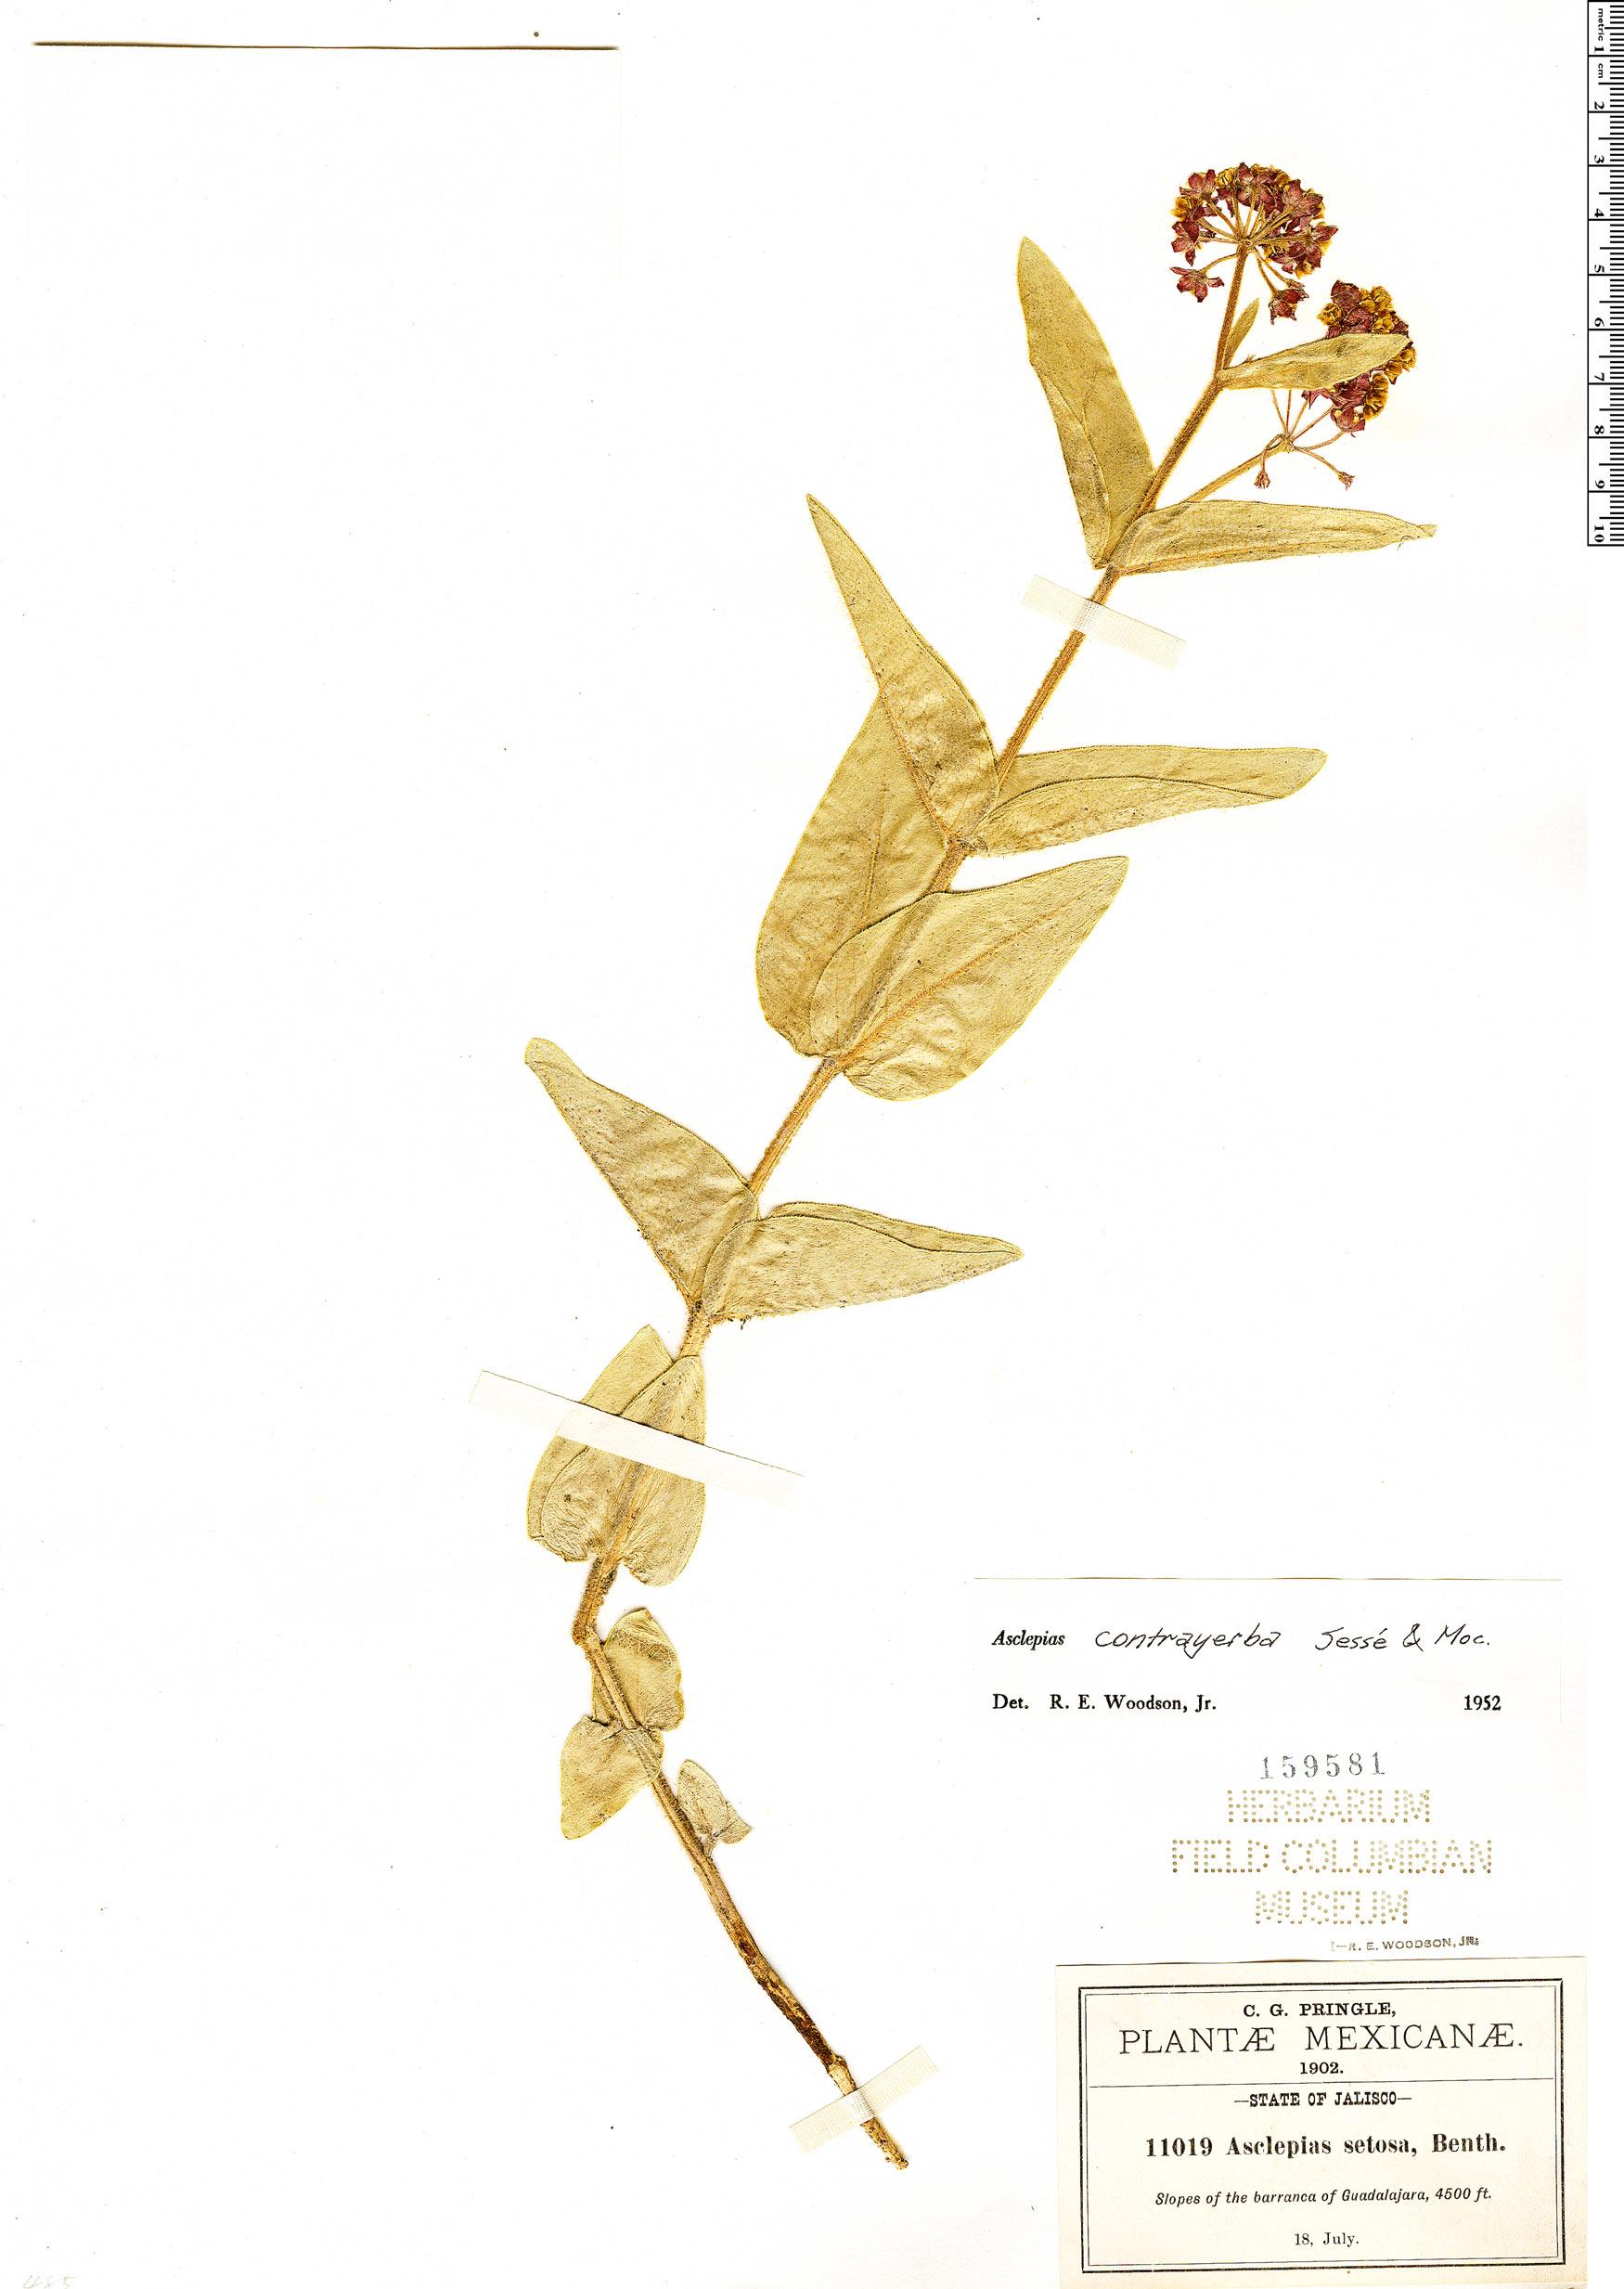 Specimen: Asclepias contrayerba